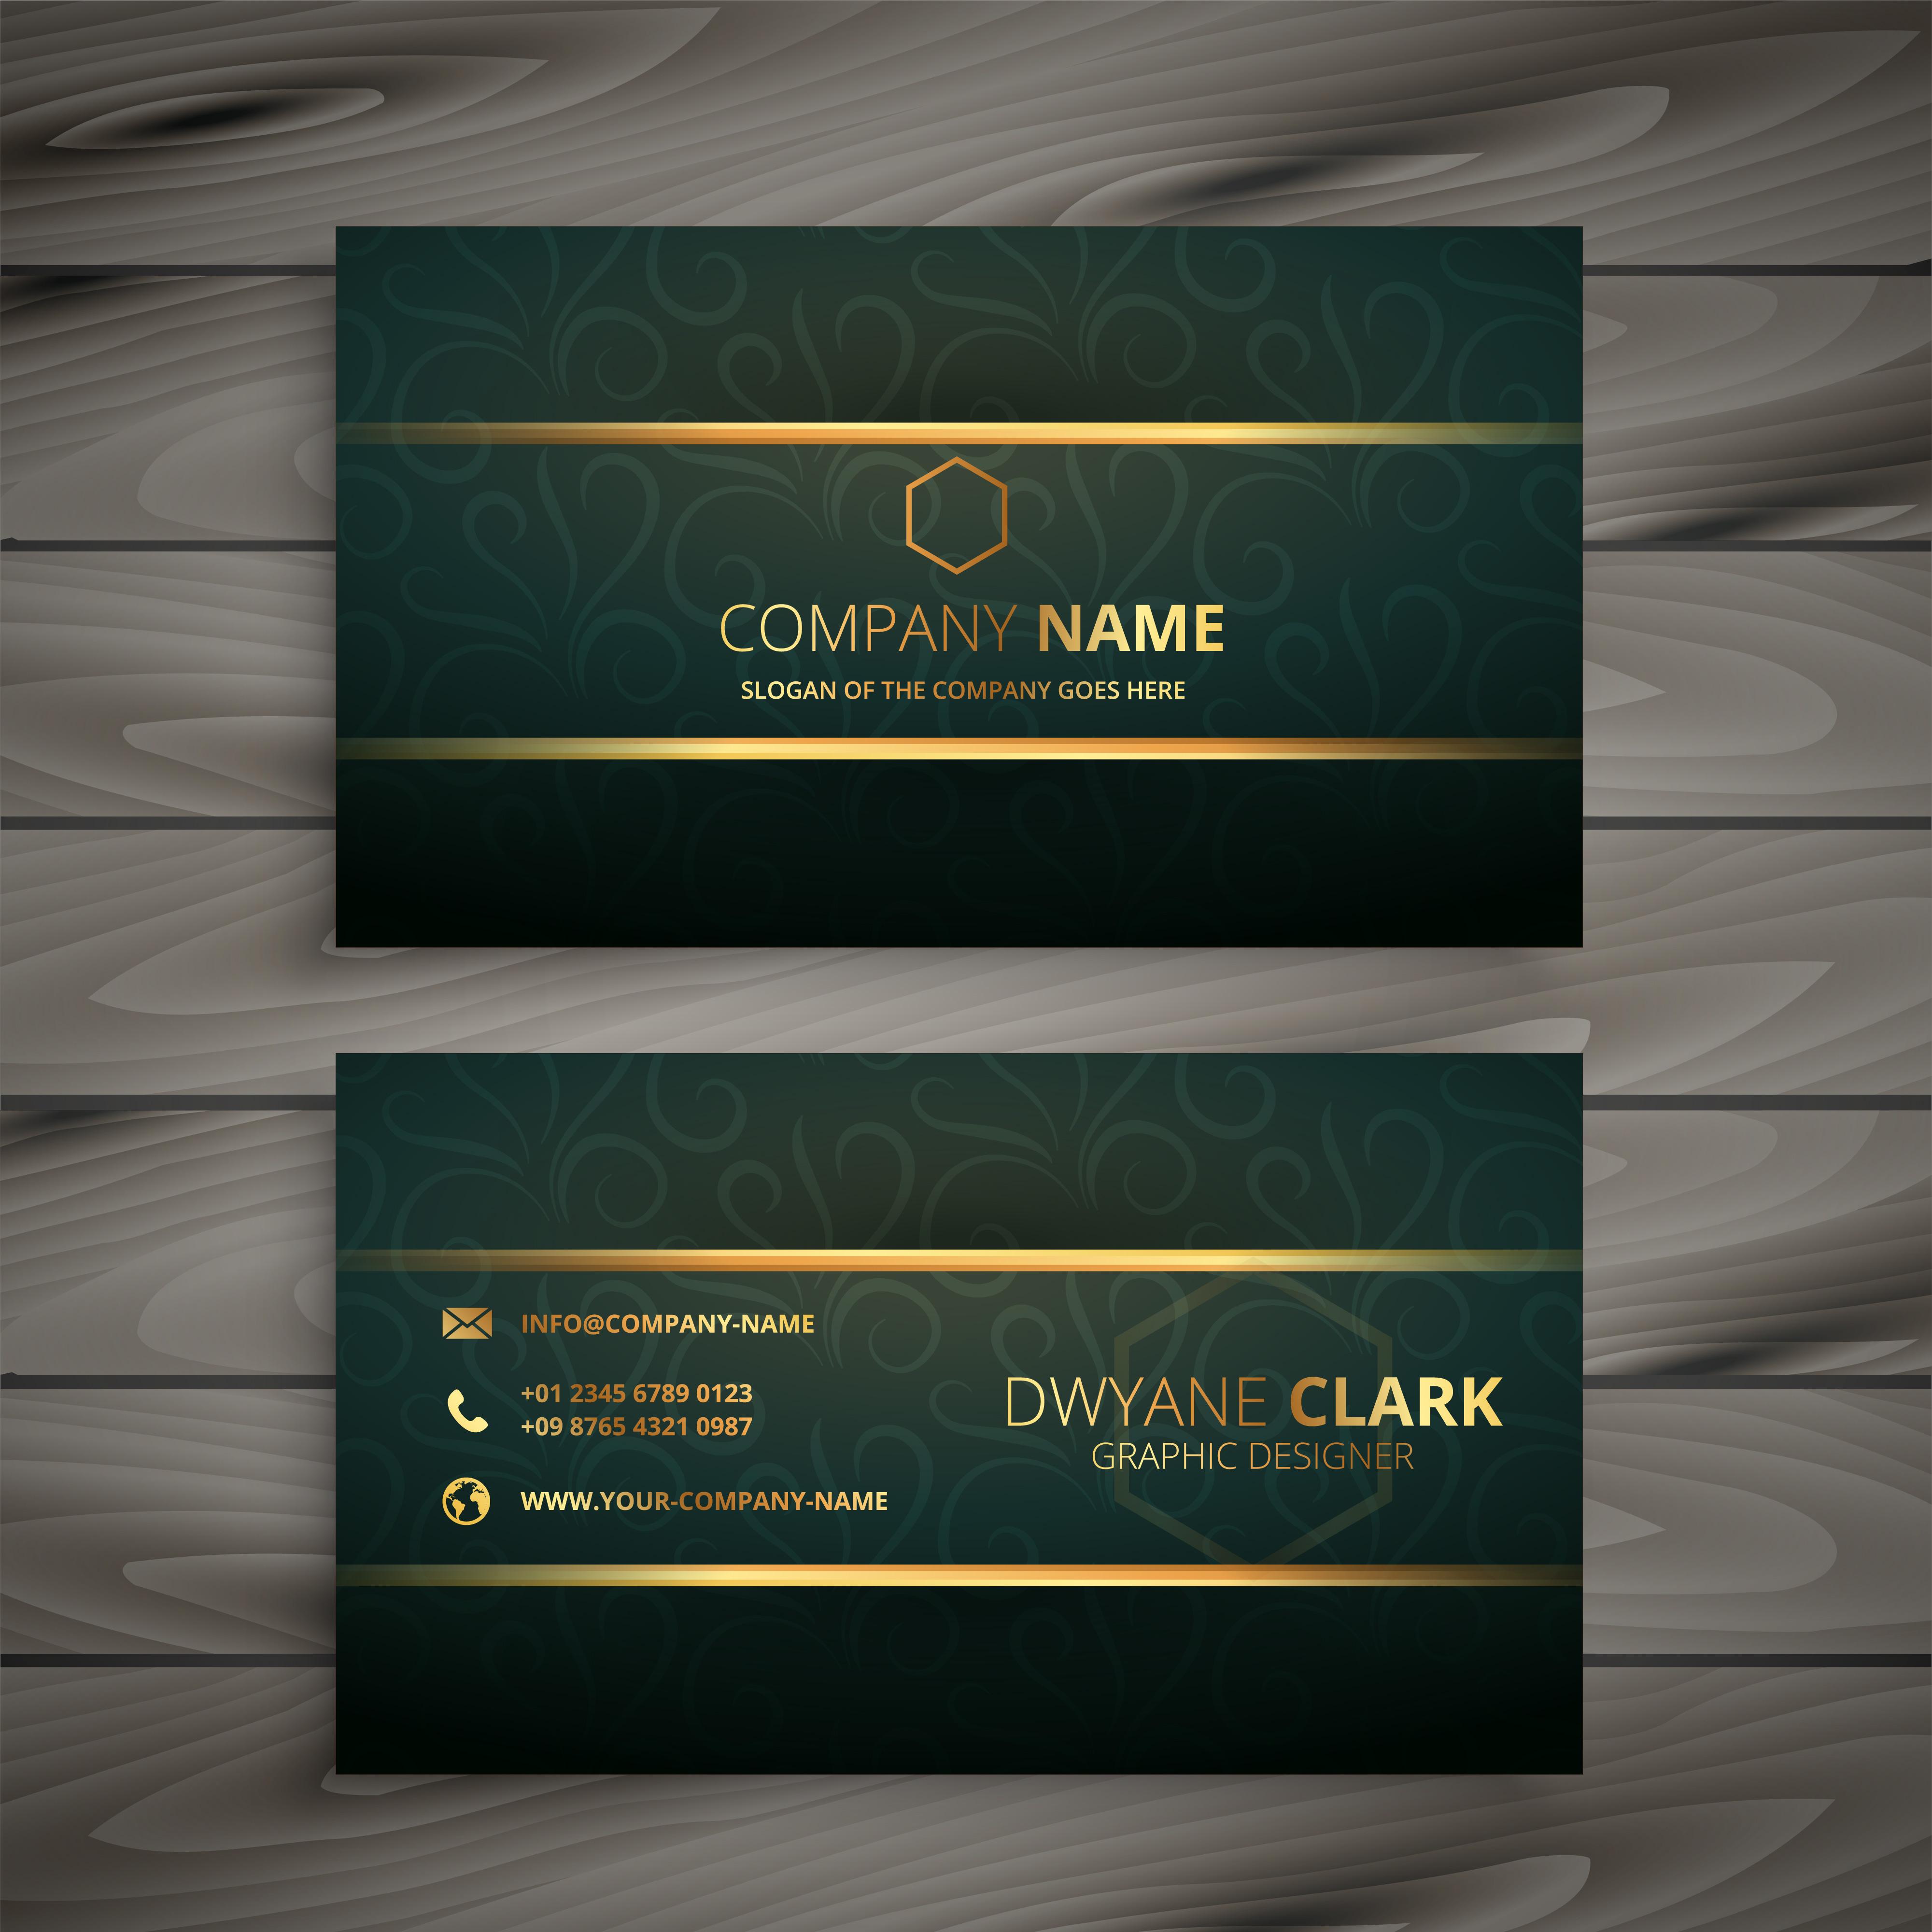 Premium Golden Green Vintage Style Business Card